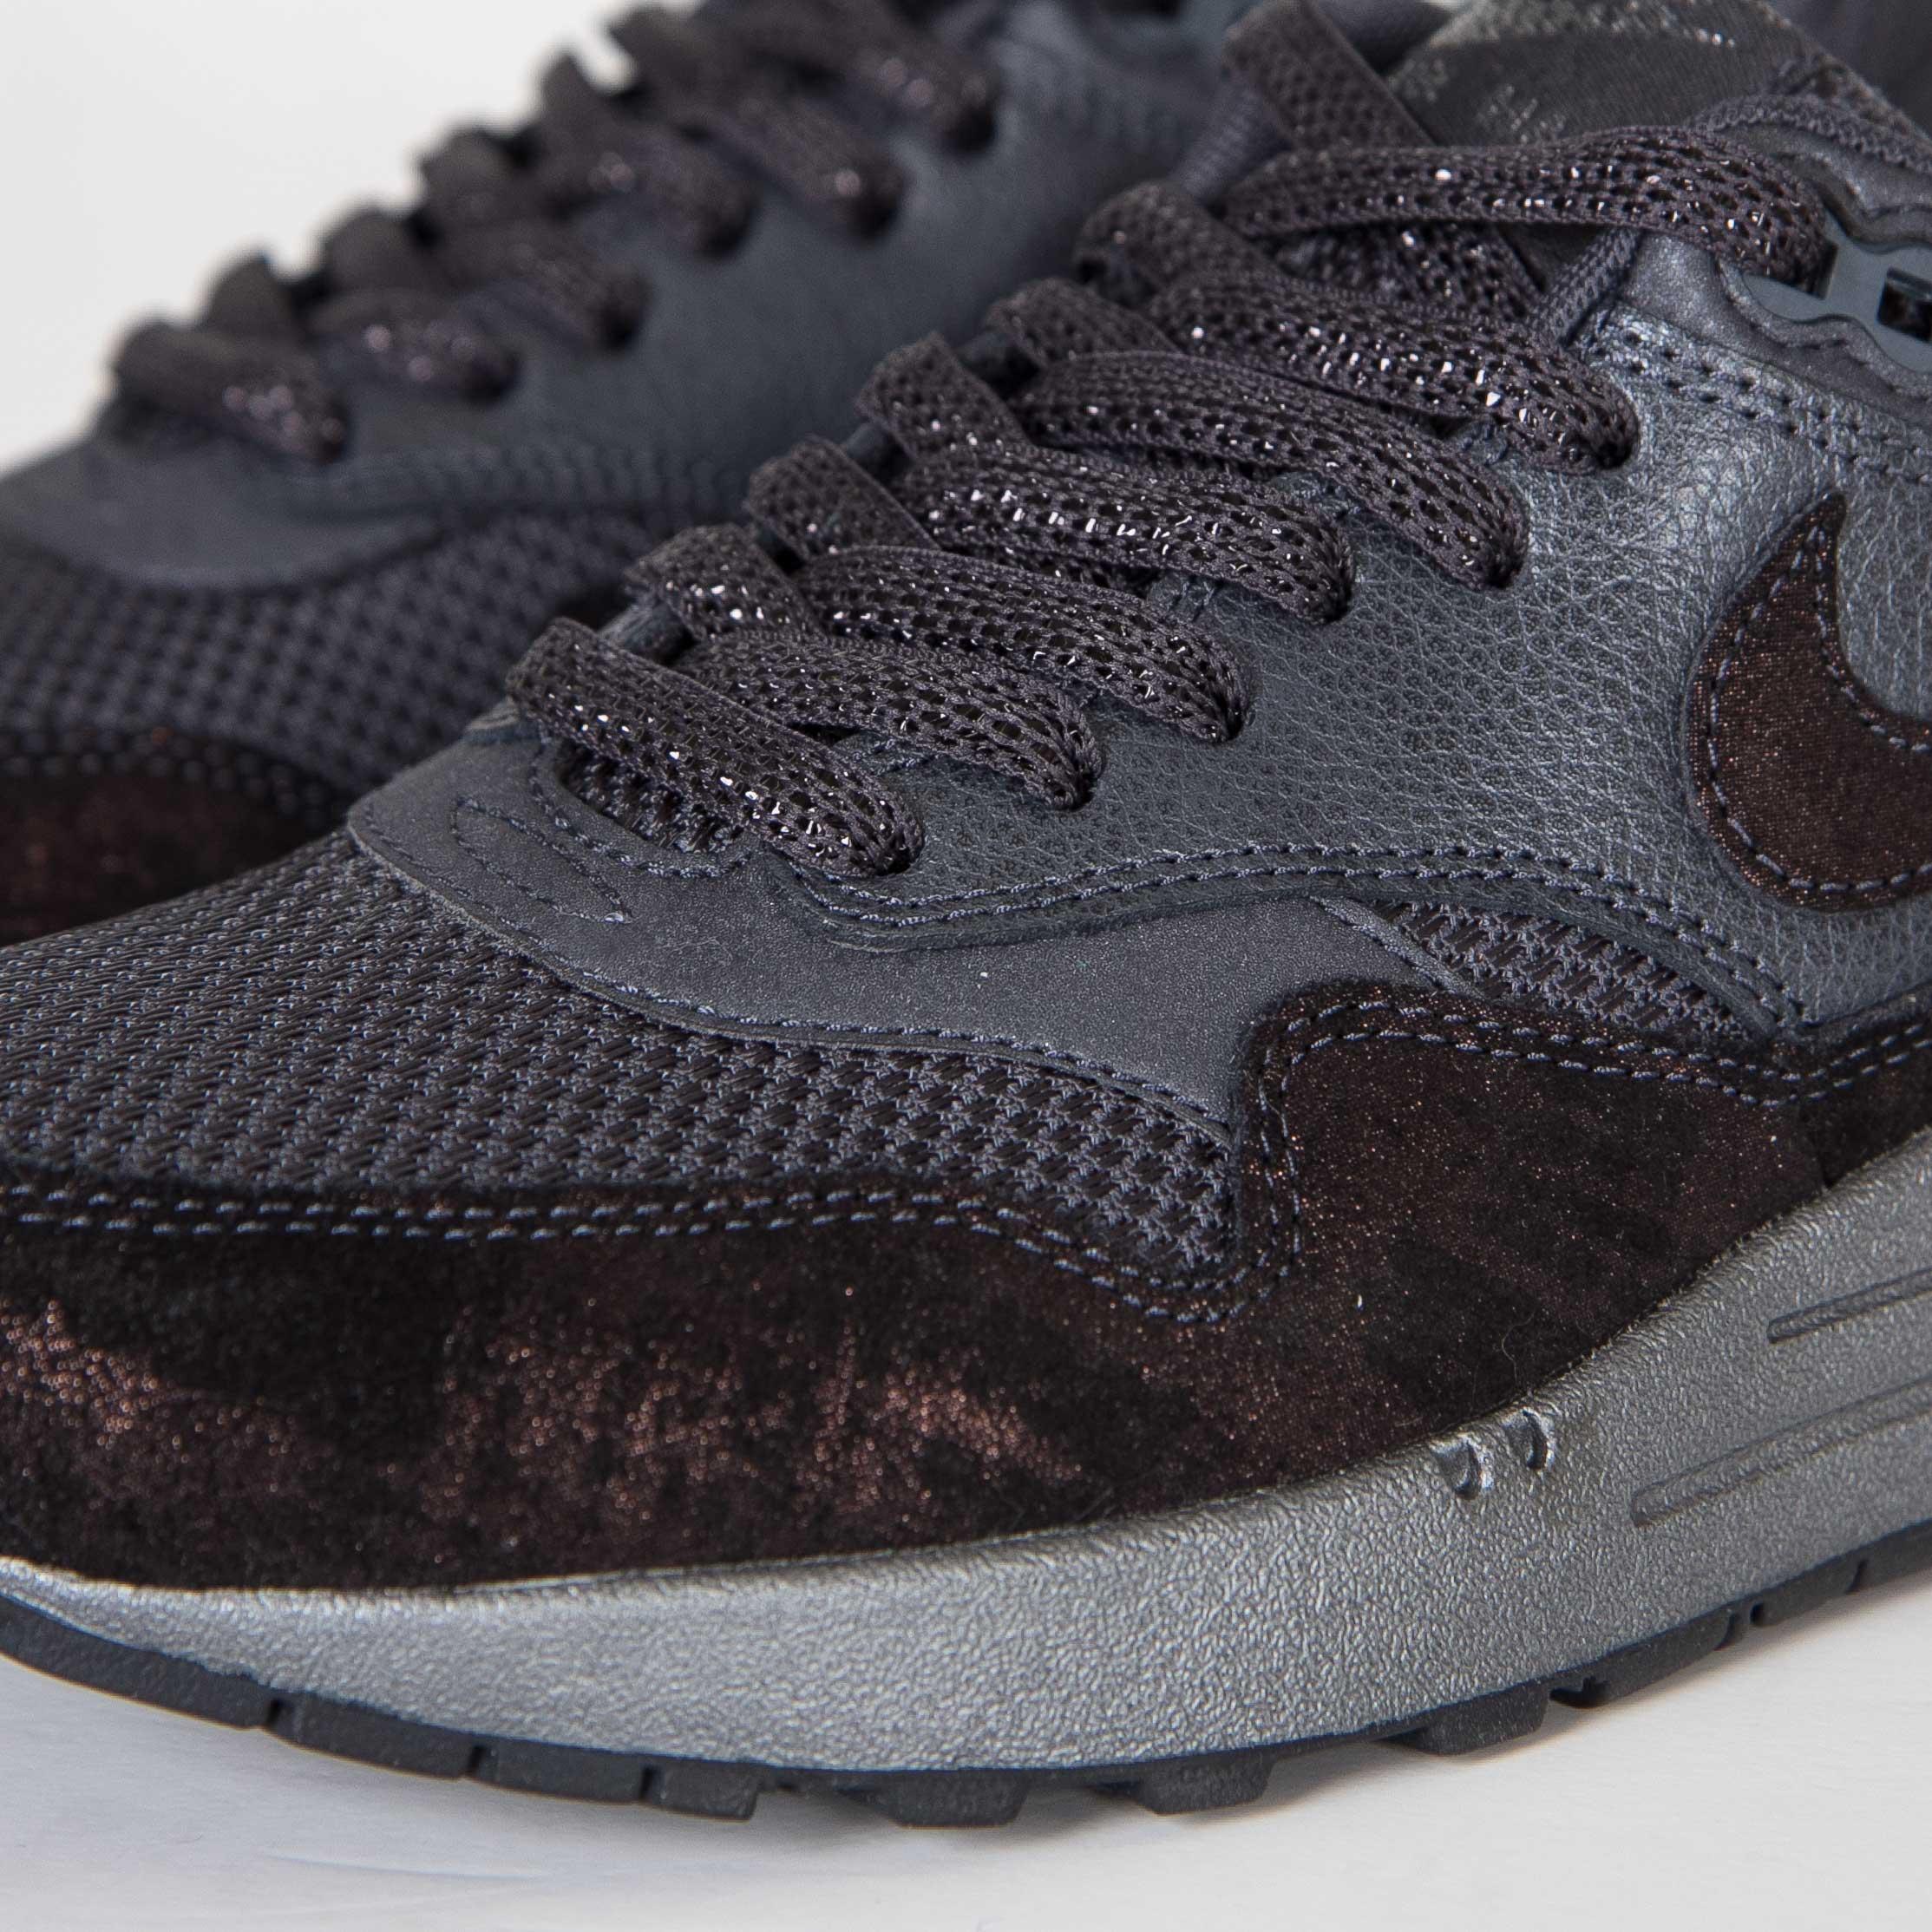 Nike Wmns Air Max 1 Premium 454746 007 Sneakersnstuff